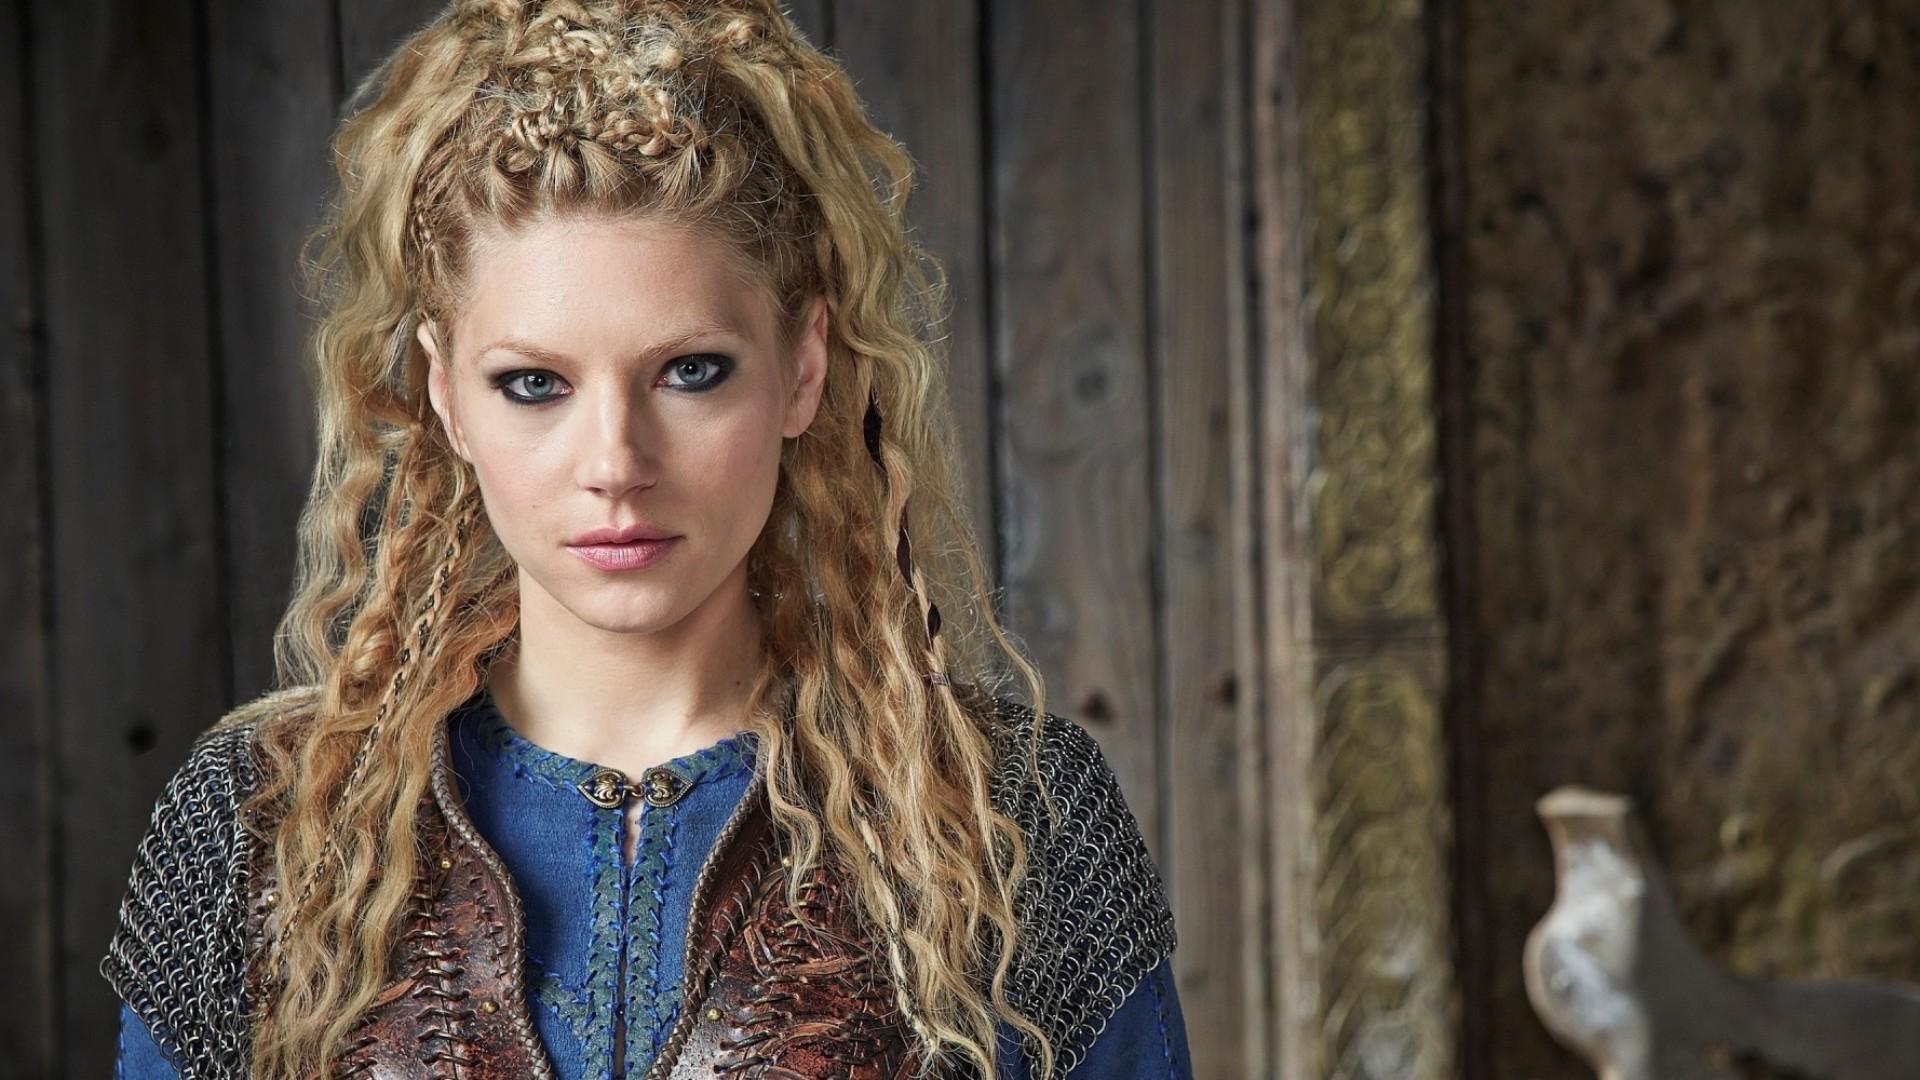 Vikings: paredeiro de Lagertha é revelado durante episódio